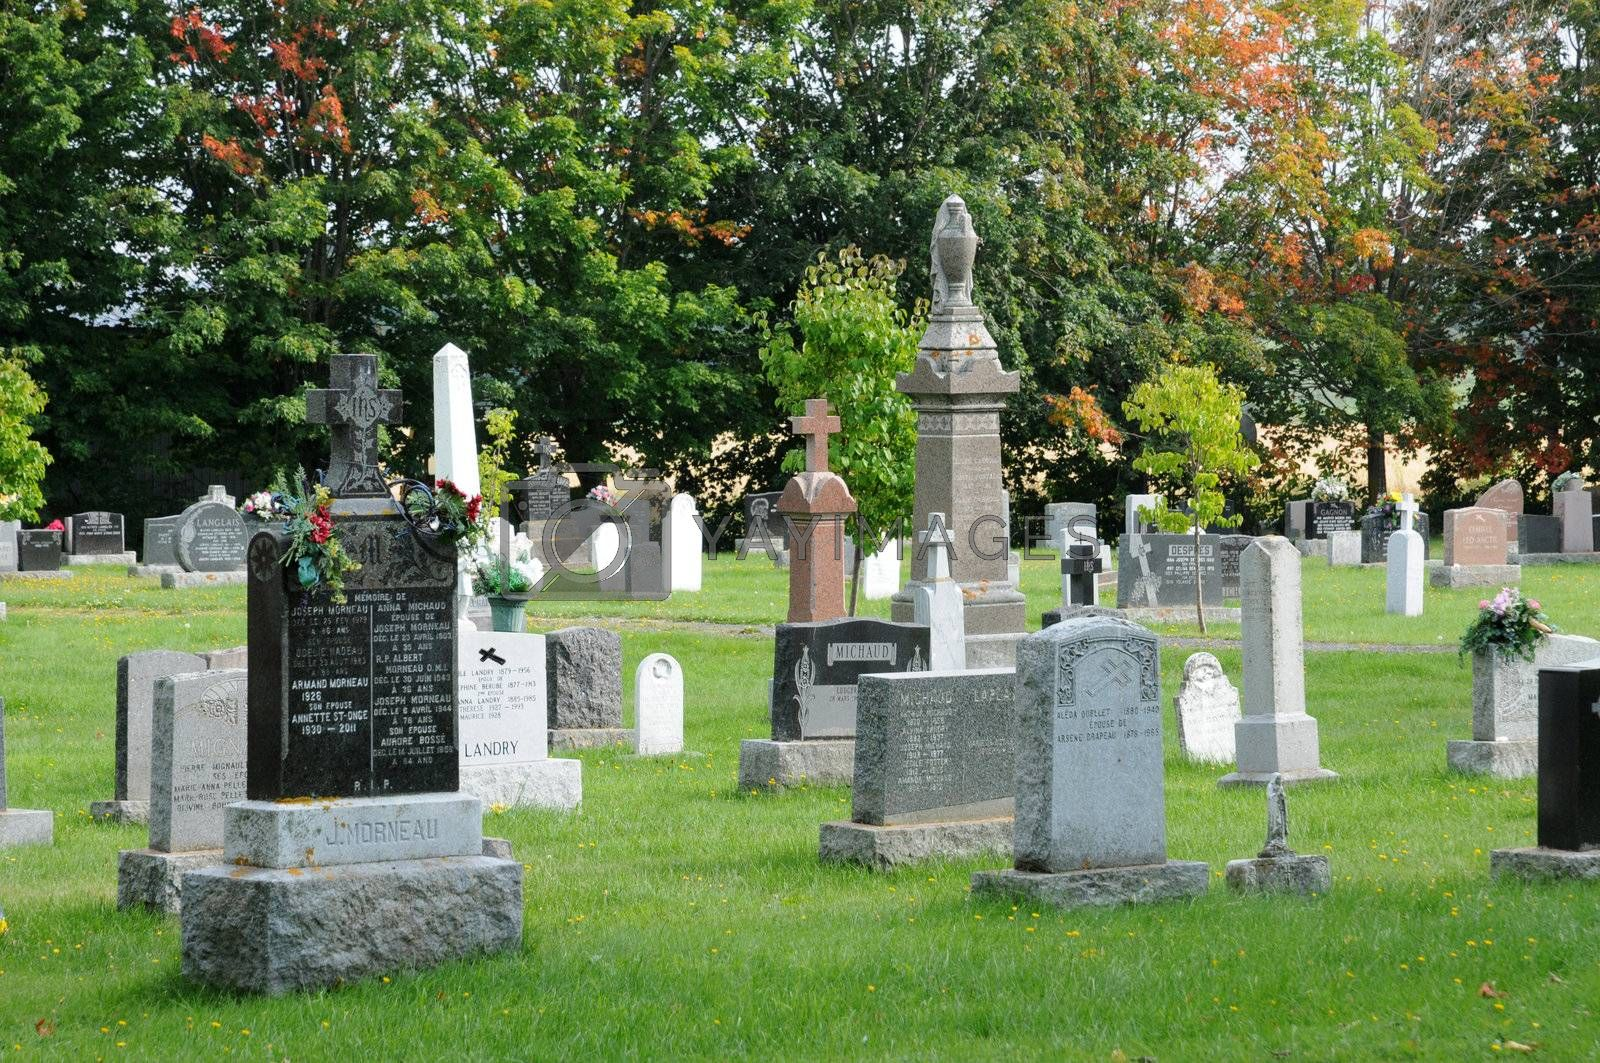 Canada, Quebec, the cemetery of Kamouraska